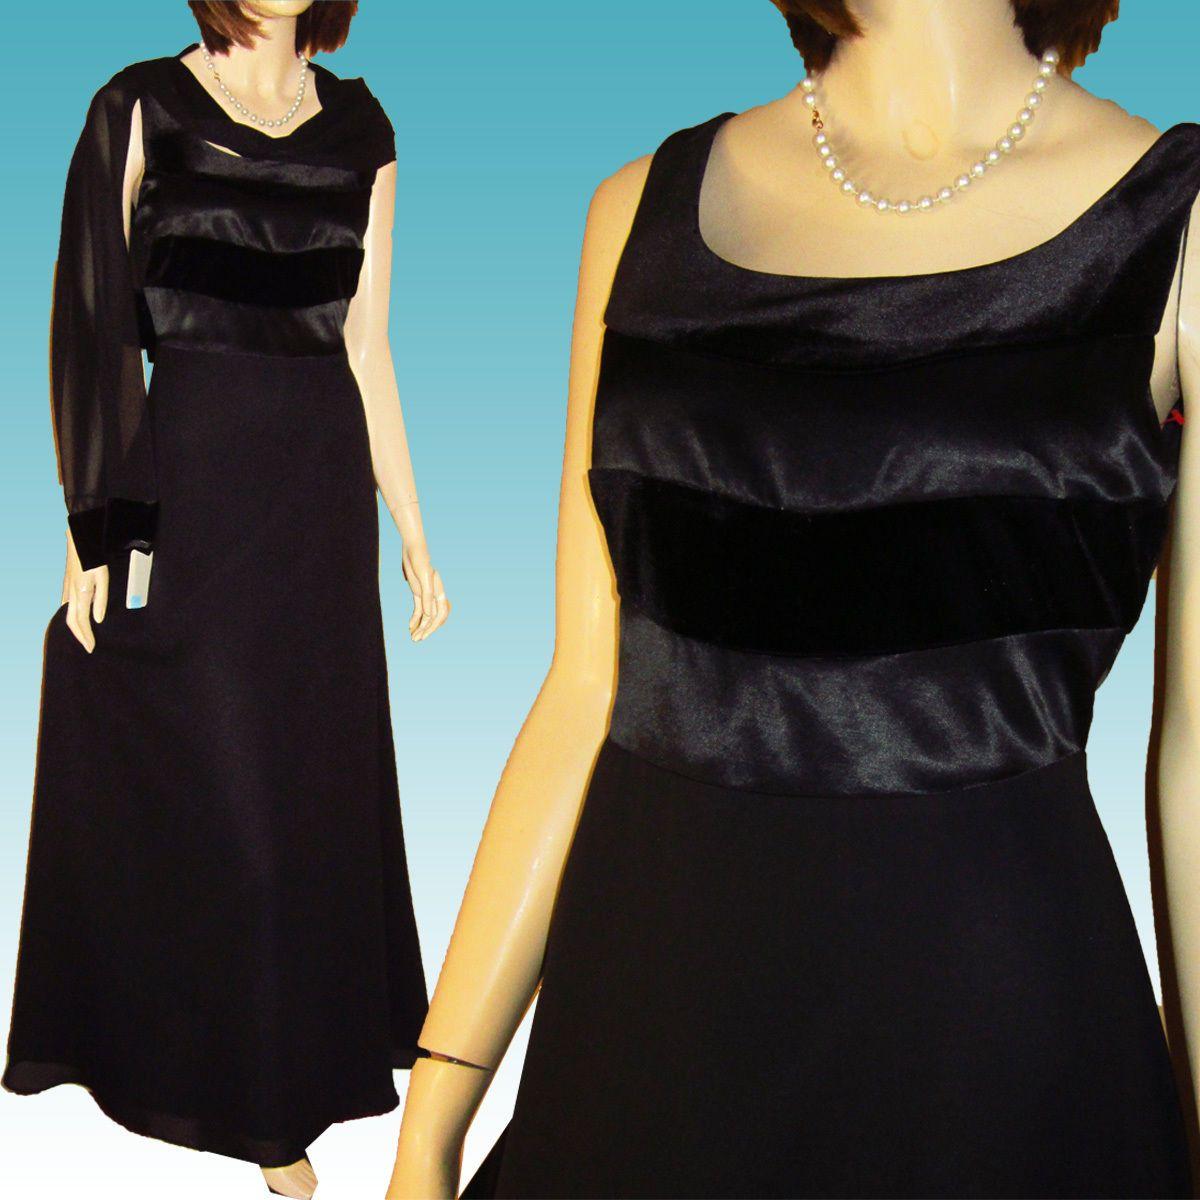 Awesome Amazing New VELVET SATIN CREPE Prom Black Tie Tuxedo Gown ...